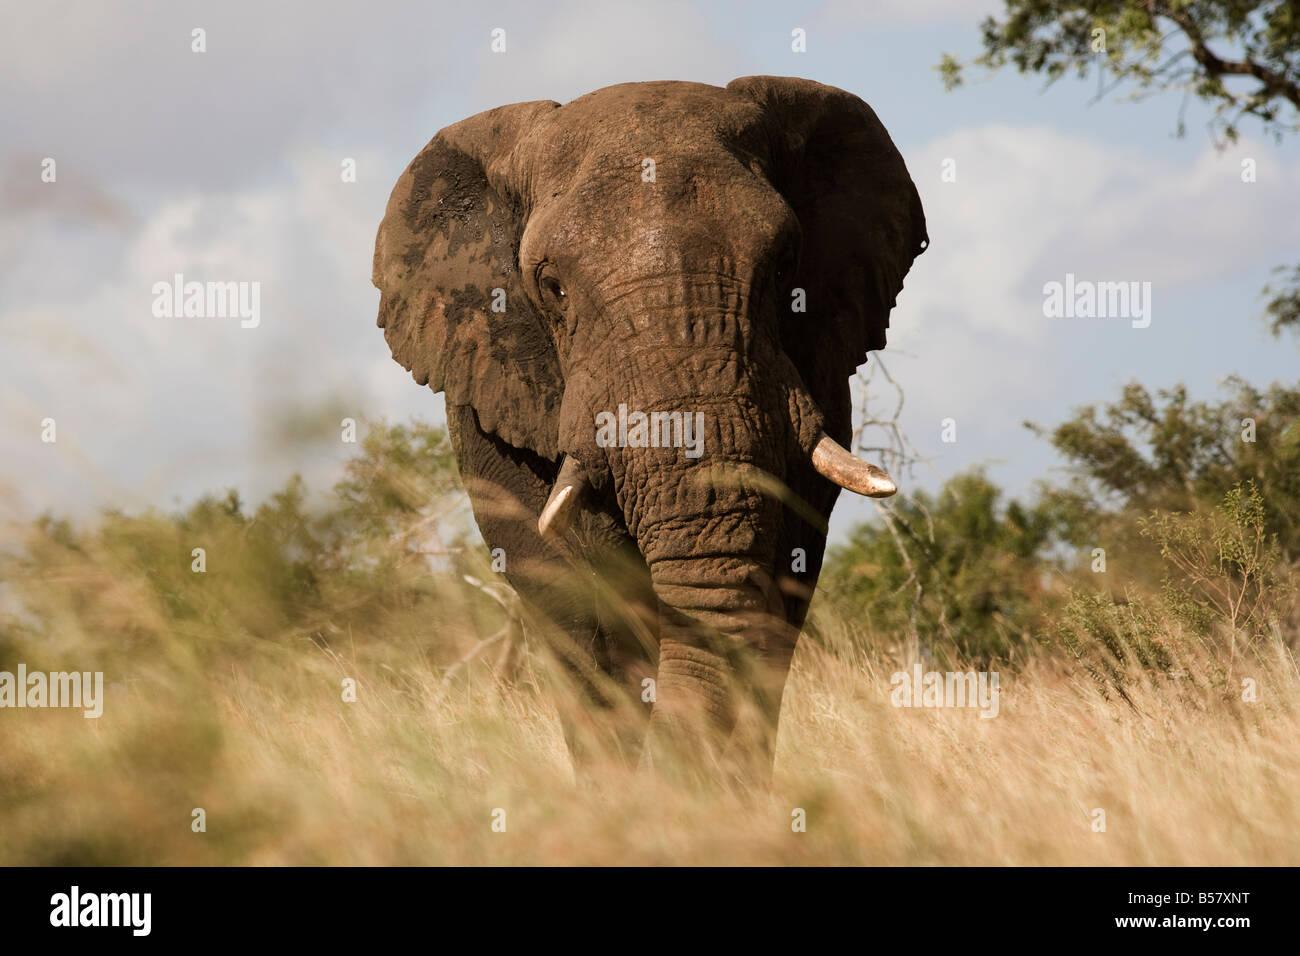 African elephant bull (Loxodonta africana), Kruger National Park, Mpumalanga, South Africa, Africa - Stock Image